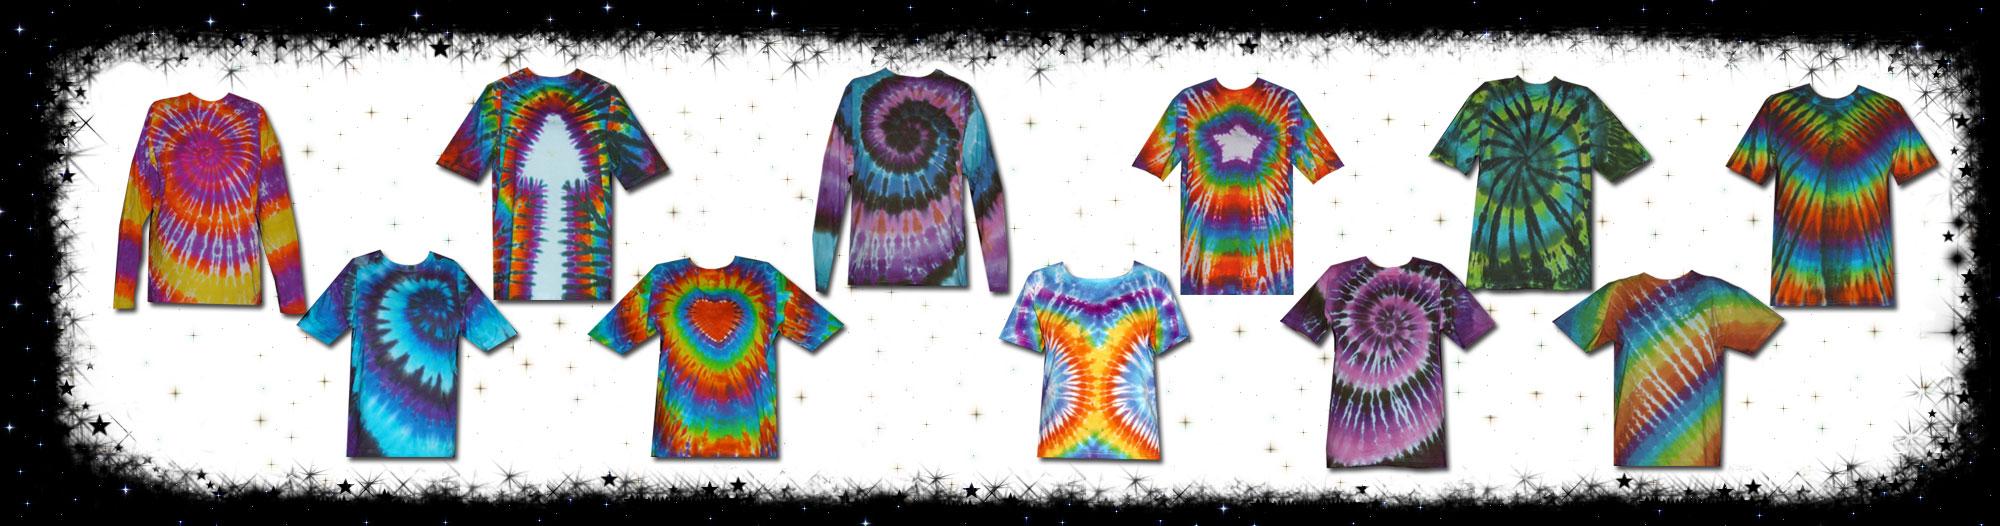 7aabbab7 Adult Unisex Tie Dye T-shirts - Cosmic-Corner.com